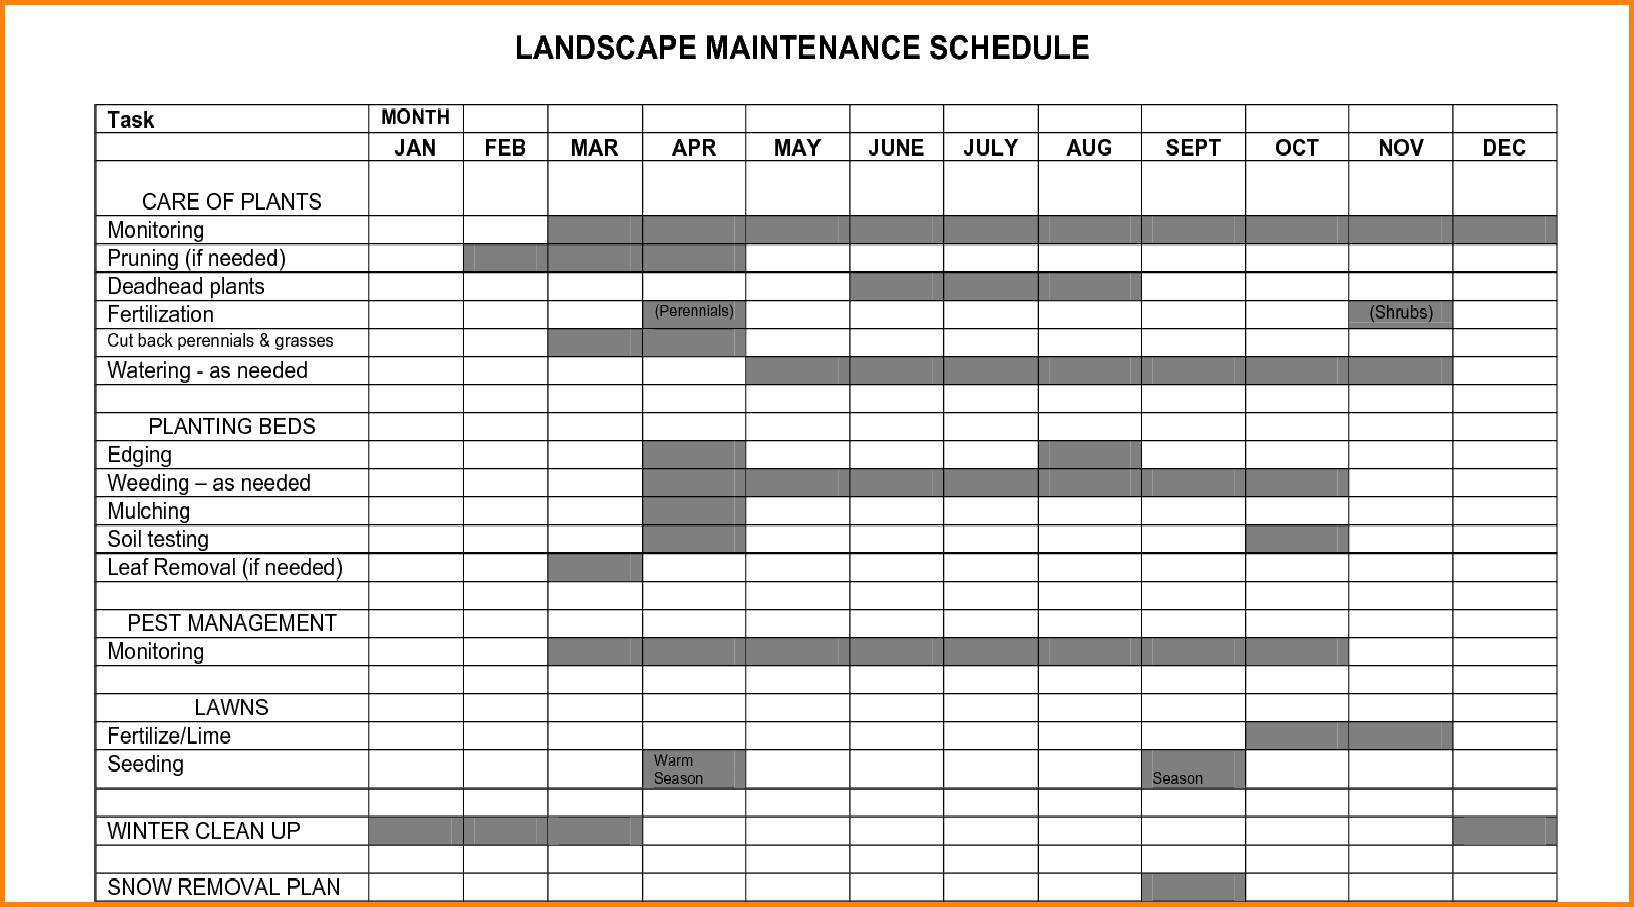 Plant Maintenance Schedule Template Excel House Maintenance Schedule 4  Fswudw